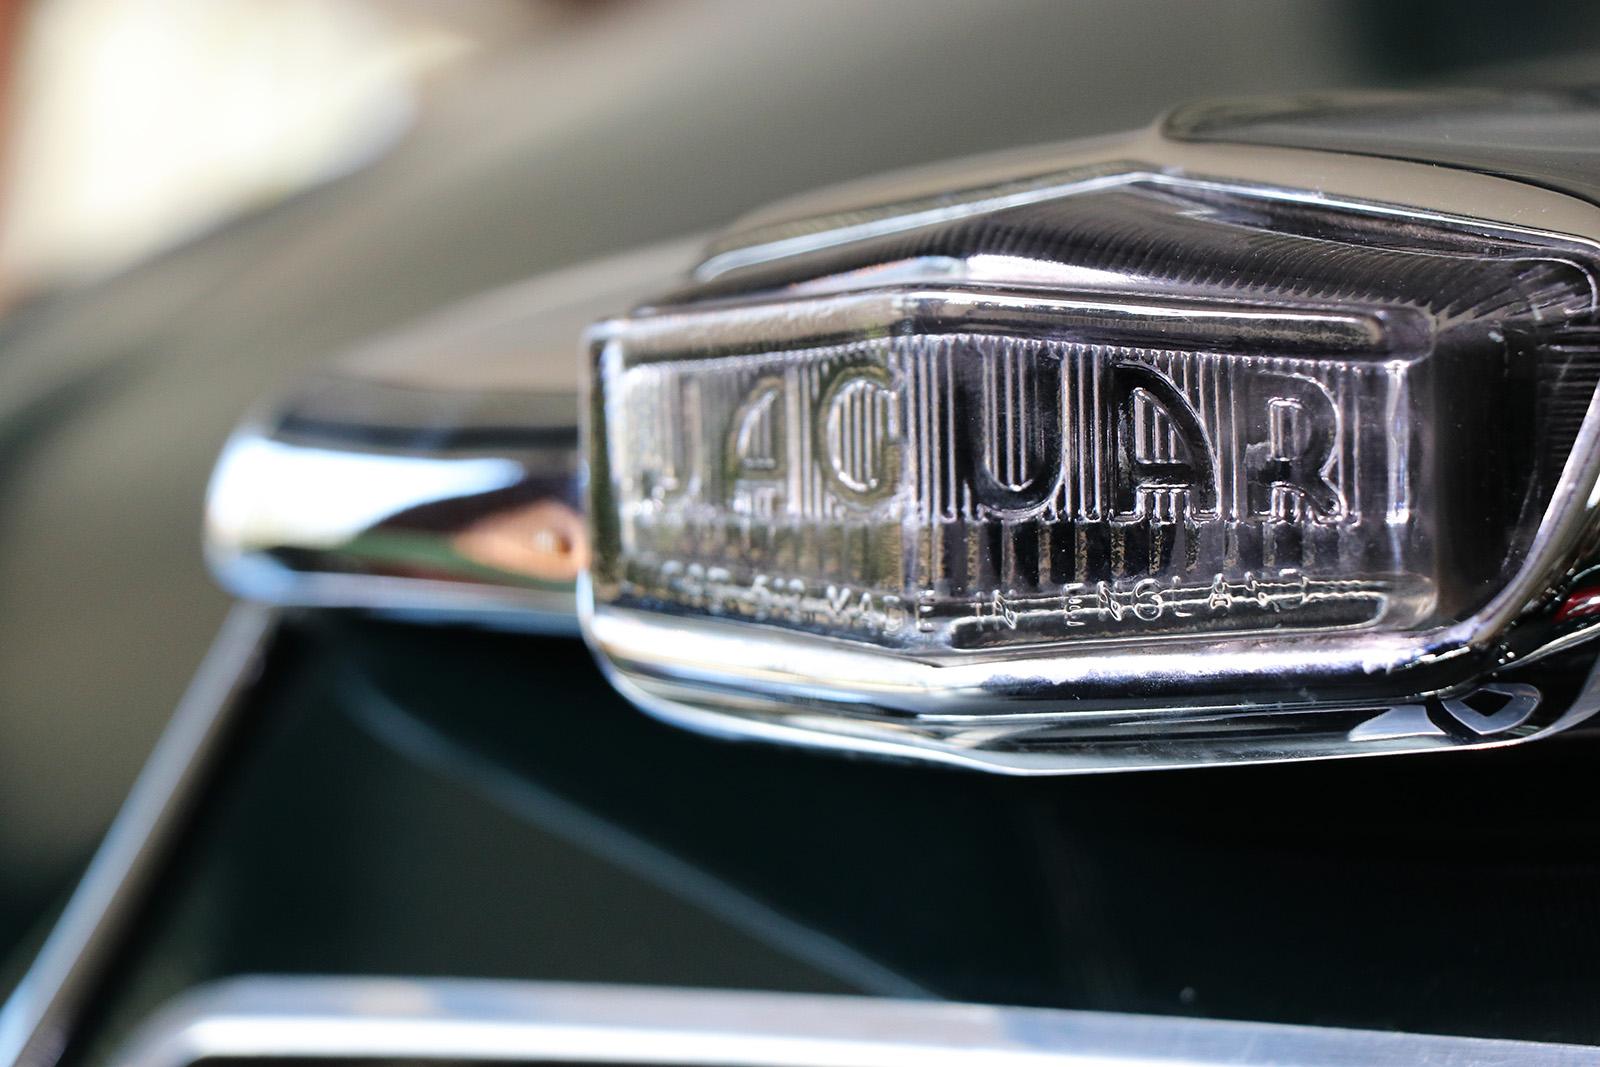 1959_Jaguar_Mark 1_sayer selection_duncan hamilton_lady cheatham_9_web.jpg